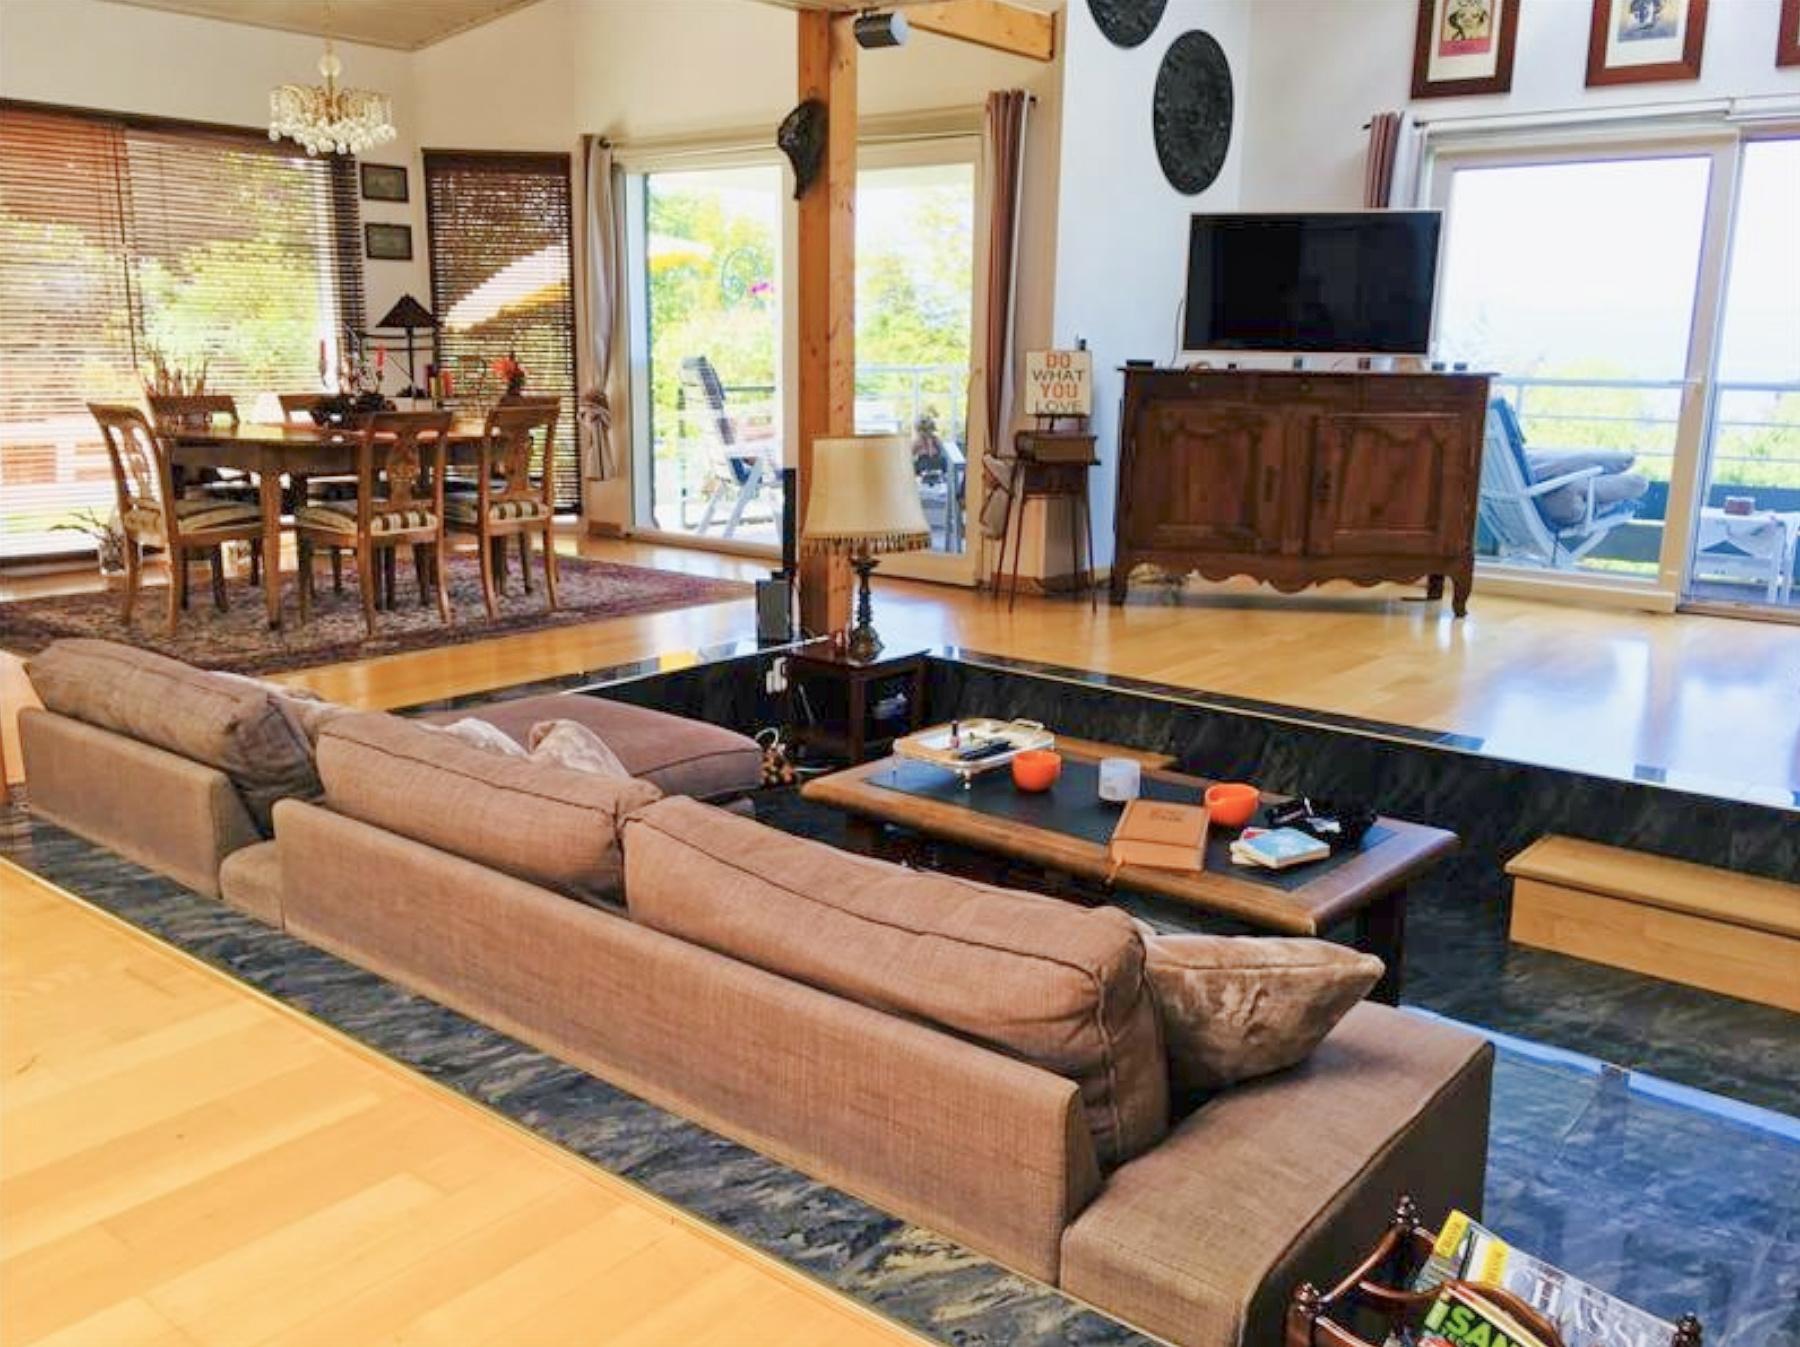 Luxury villa for sale in Evian